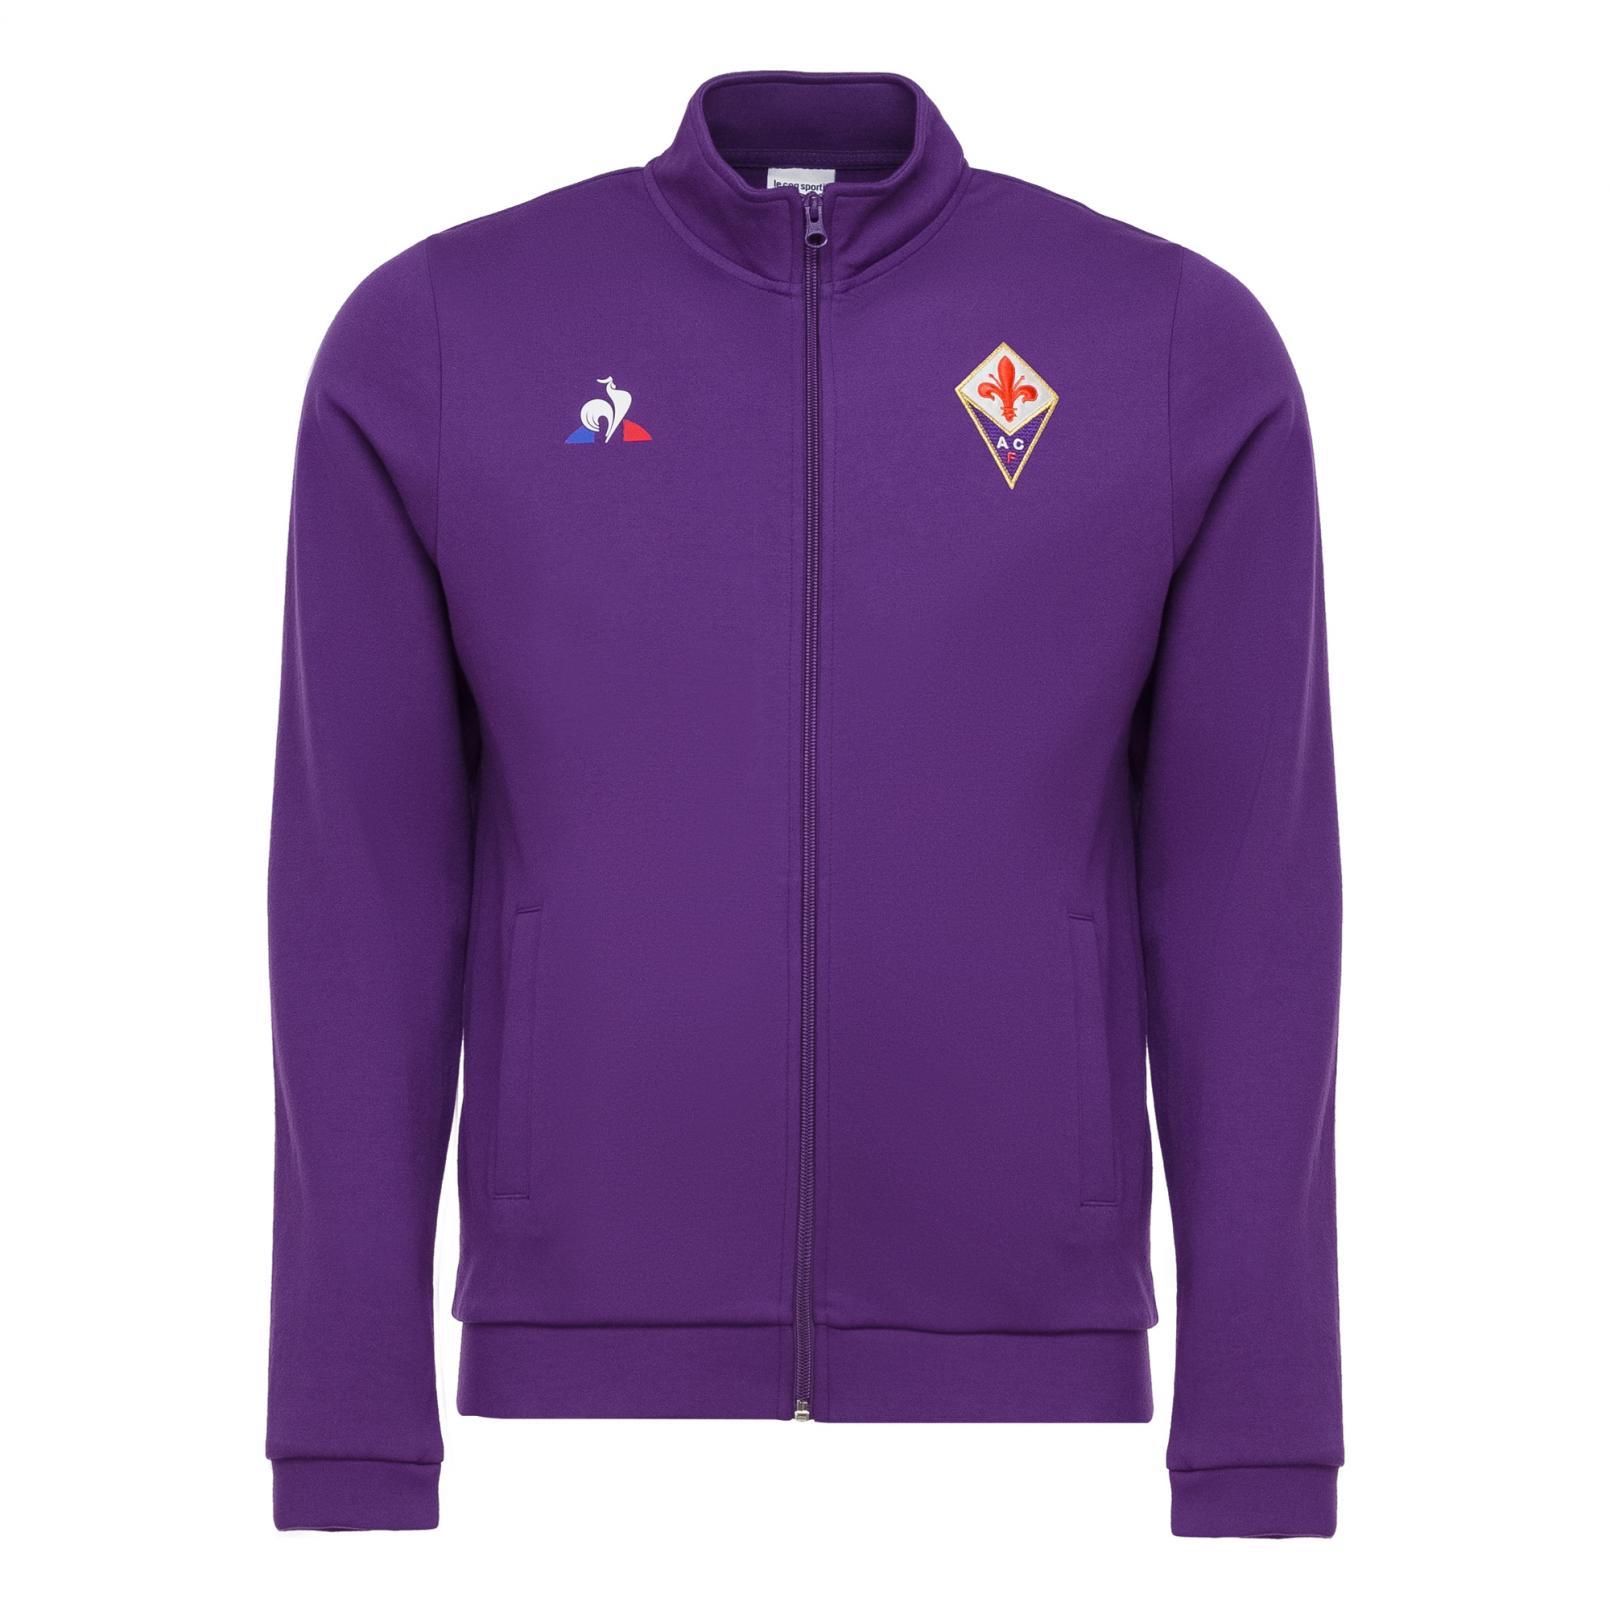 Sweat tops – Le Coq Sportif Fiorentina Pres Full zip sweatsthirt Purple